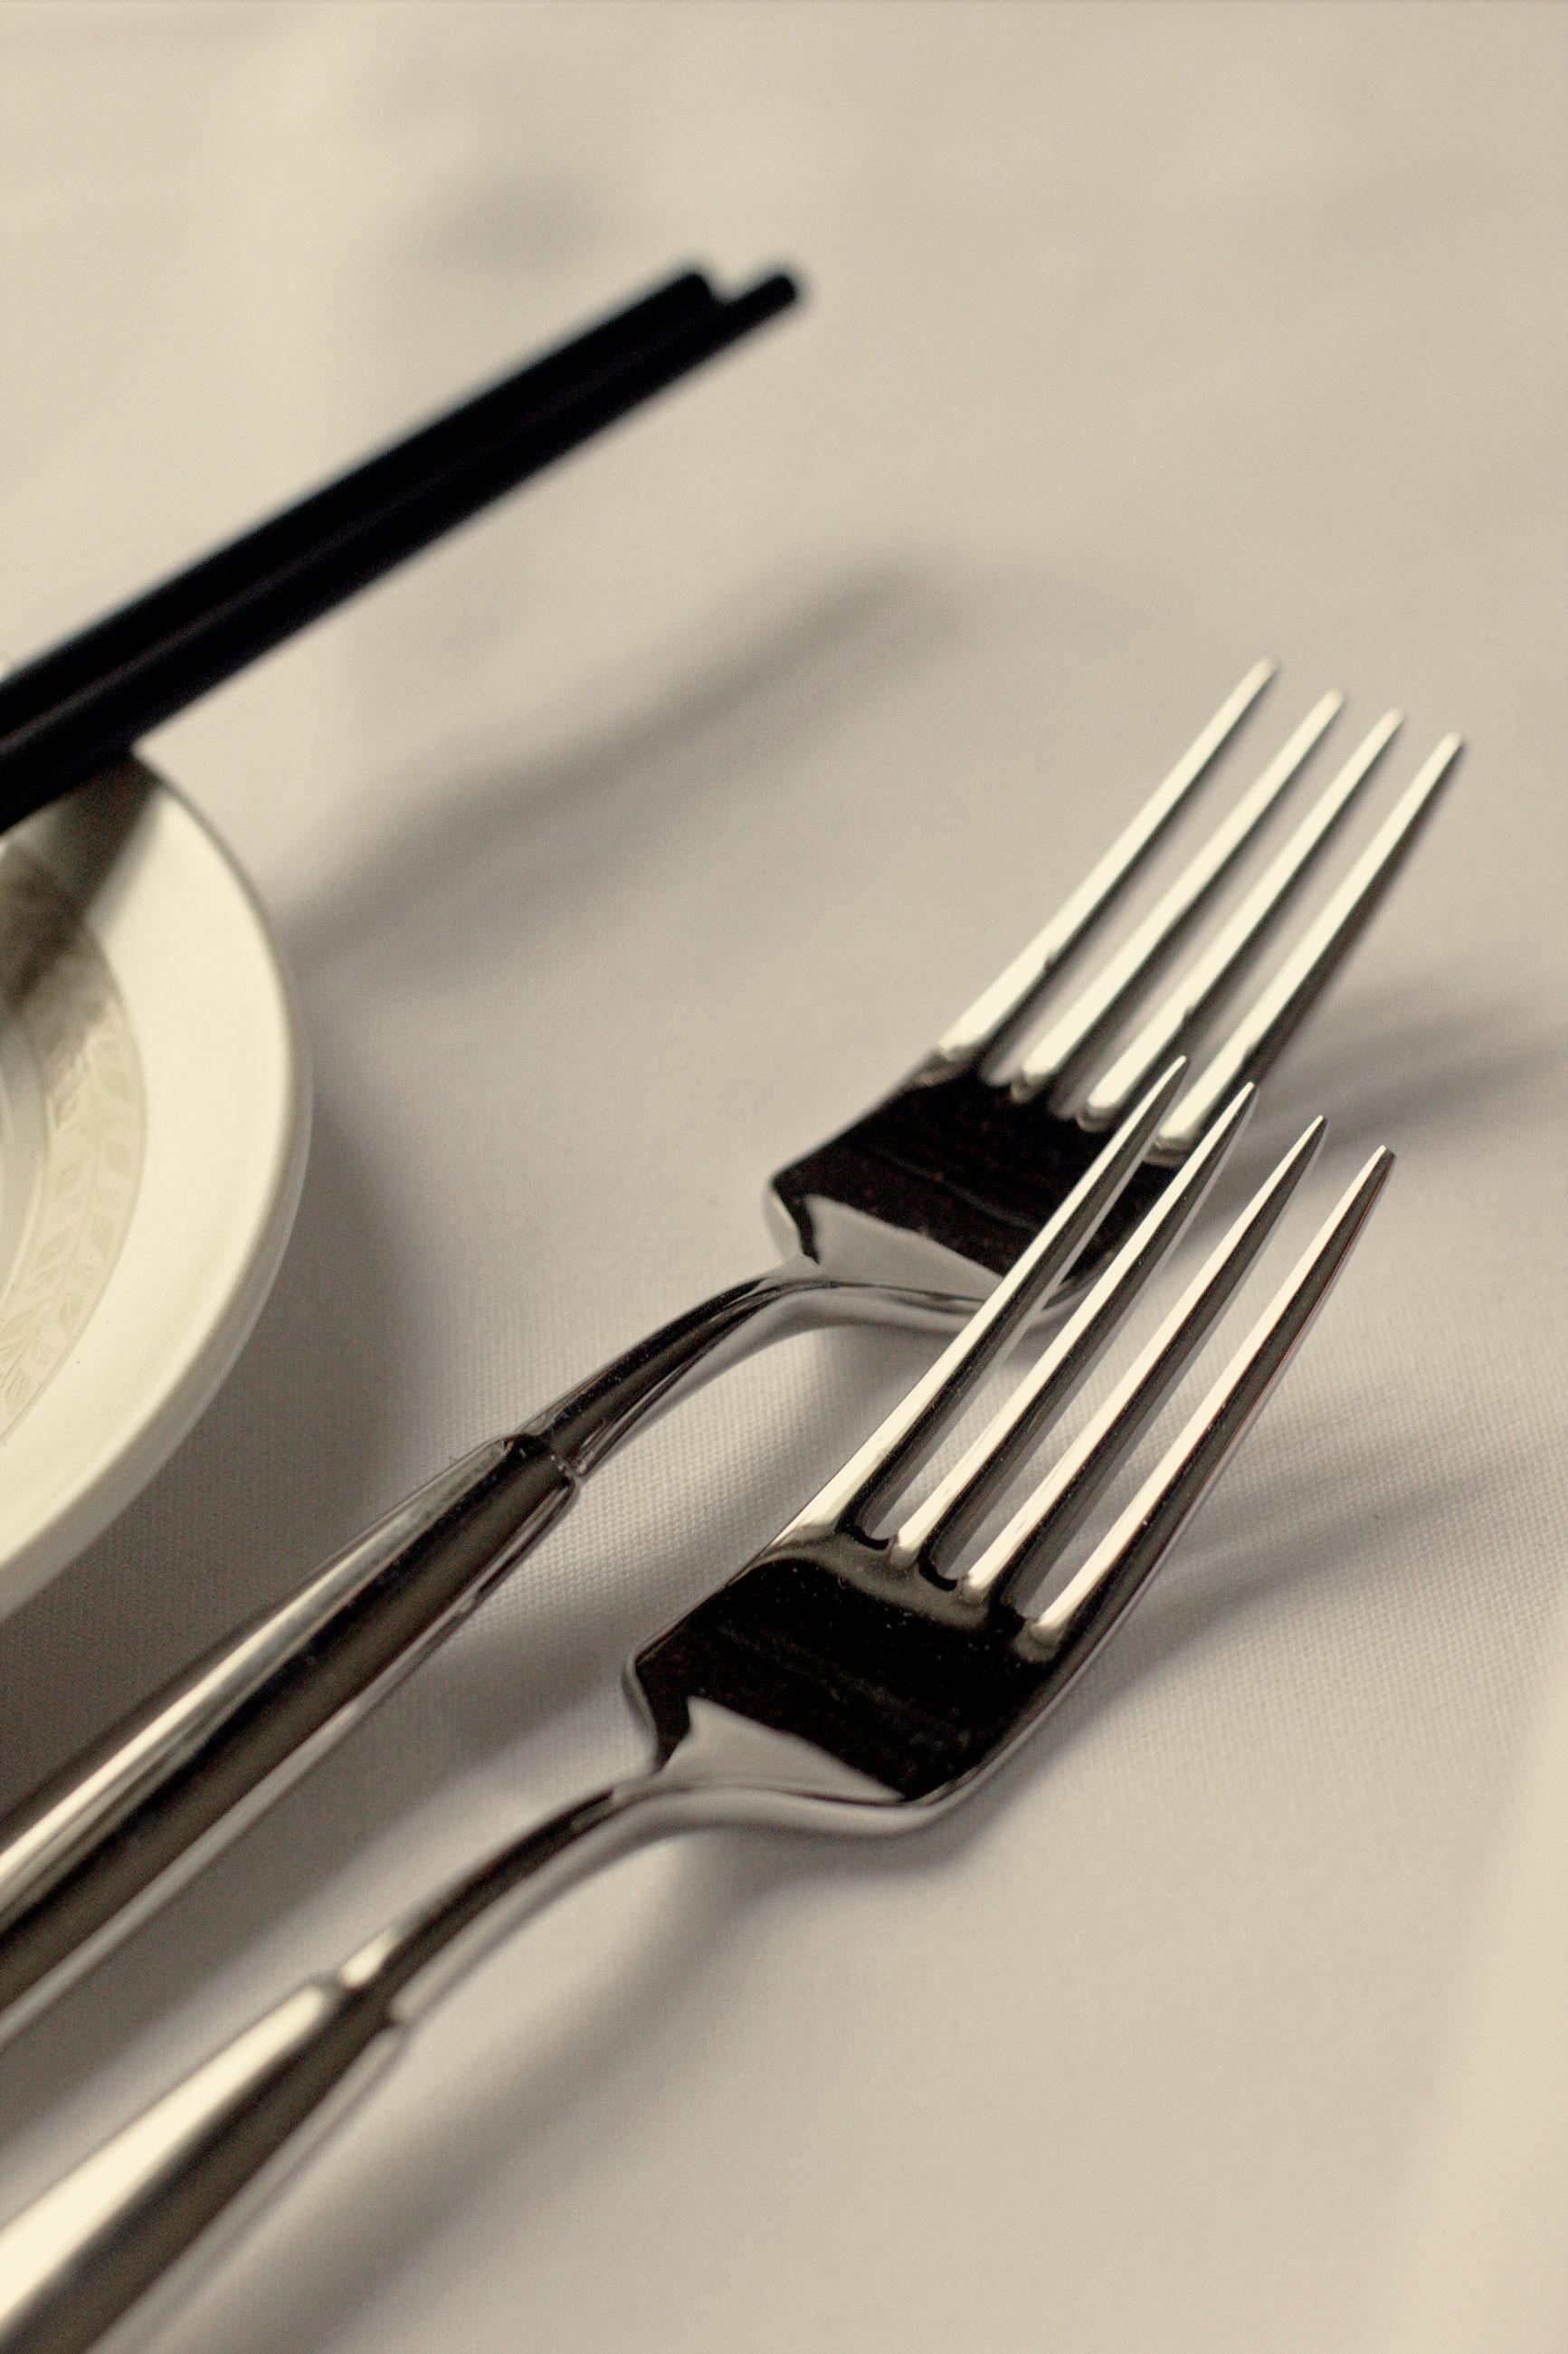 cutlery-close-up-edited.jpg